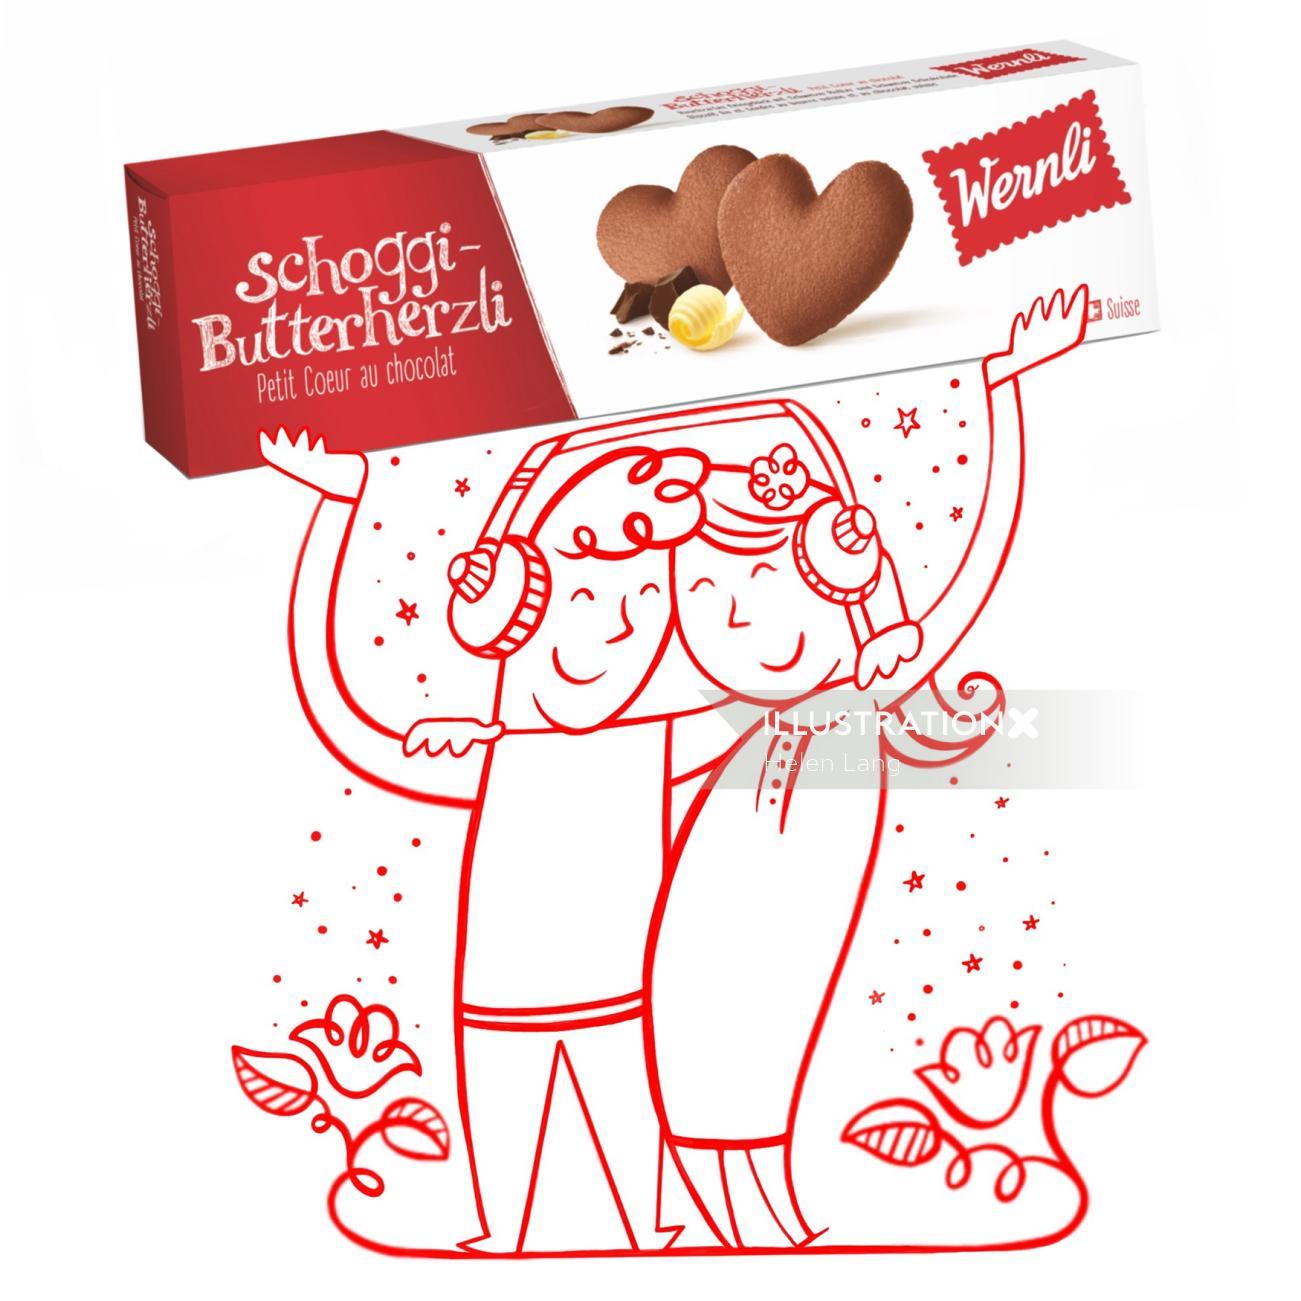 Advertising illustration of Wernli chocolat